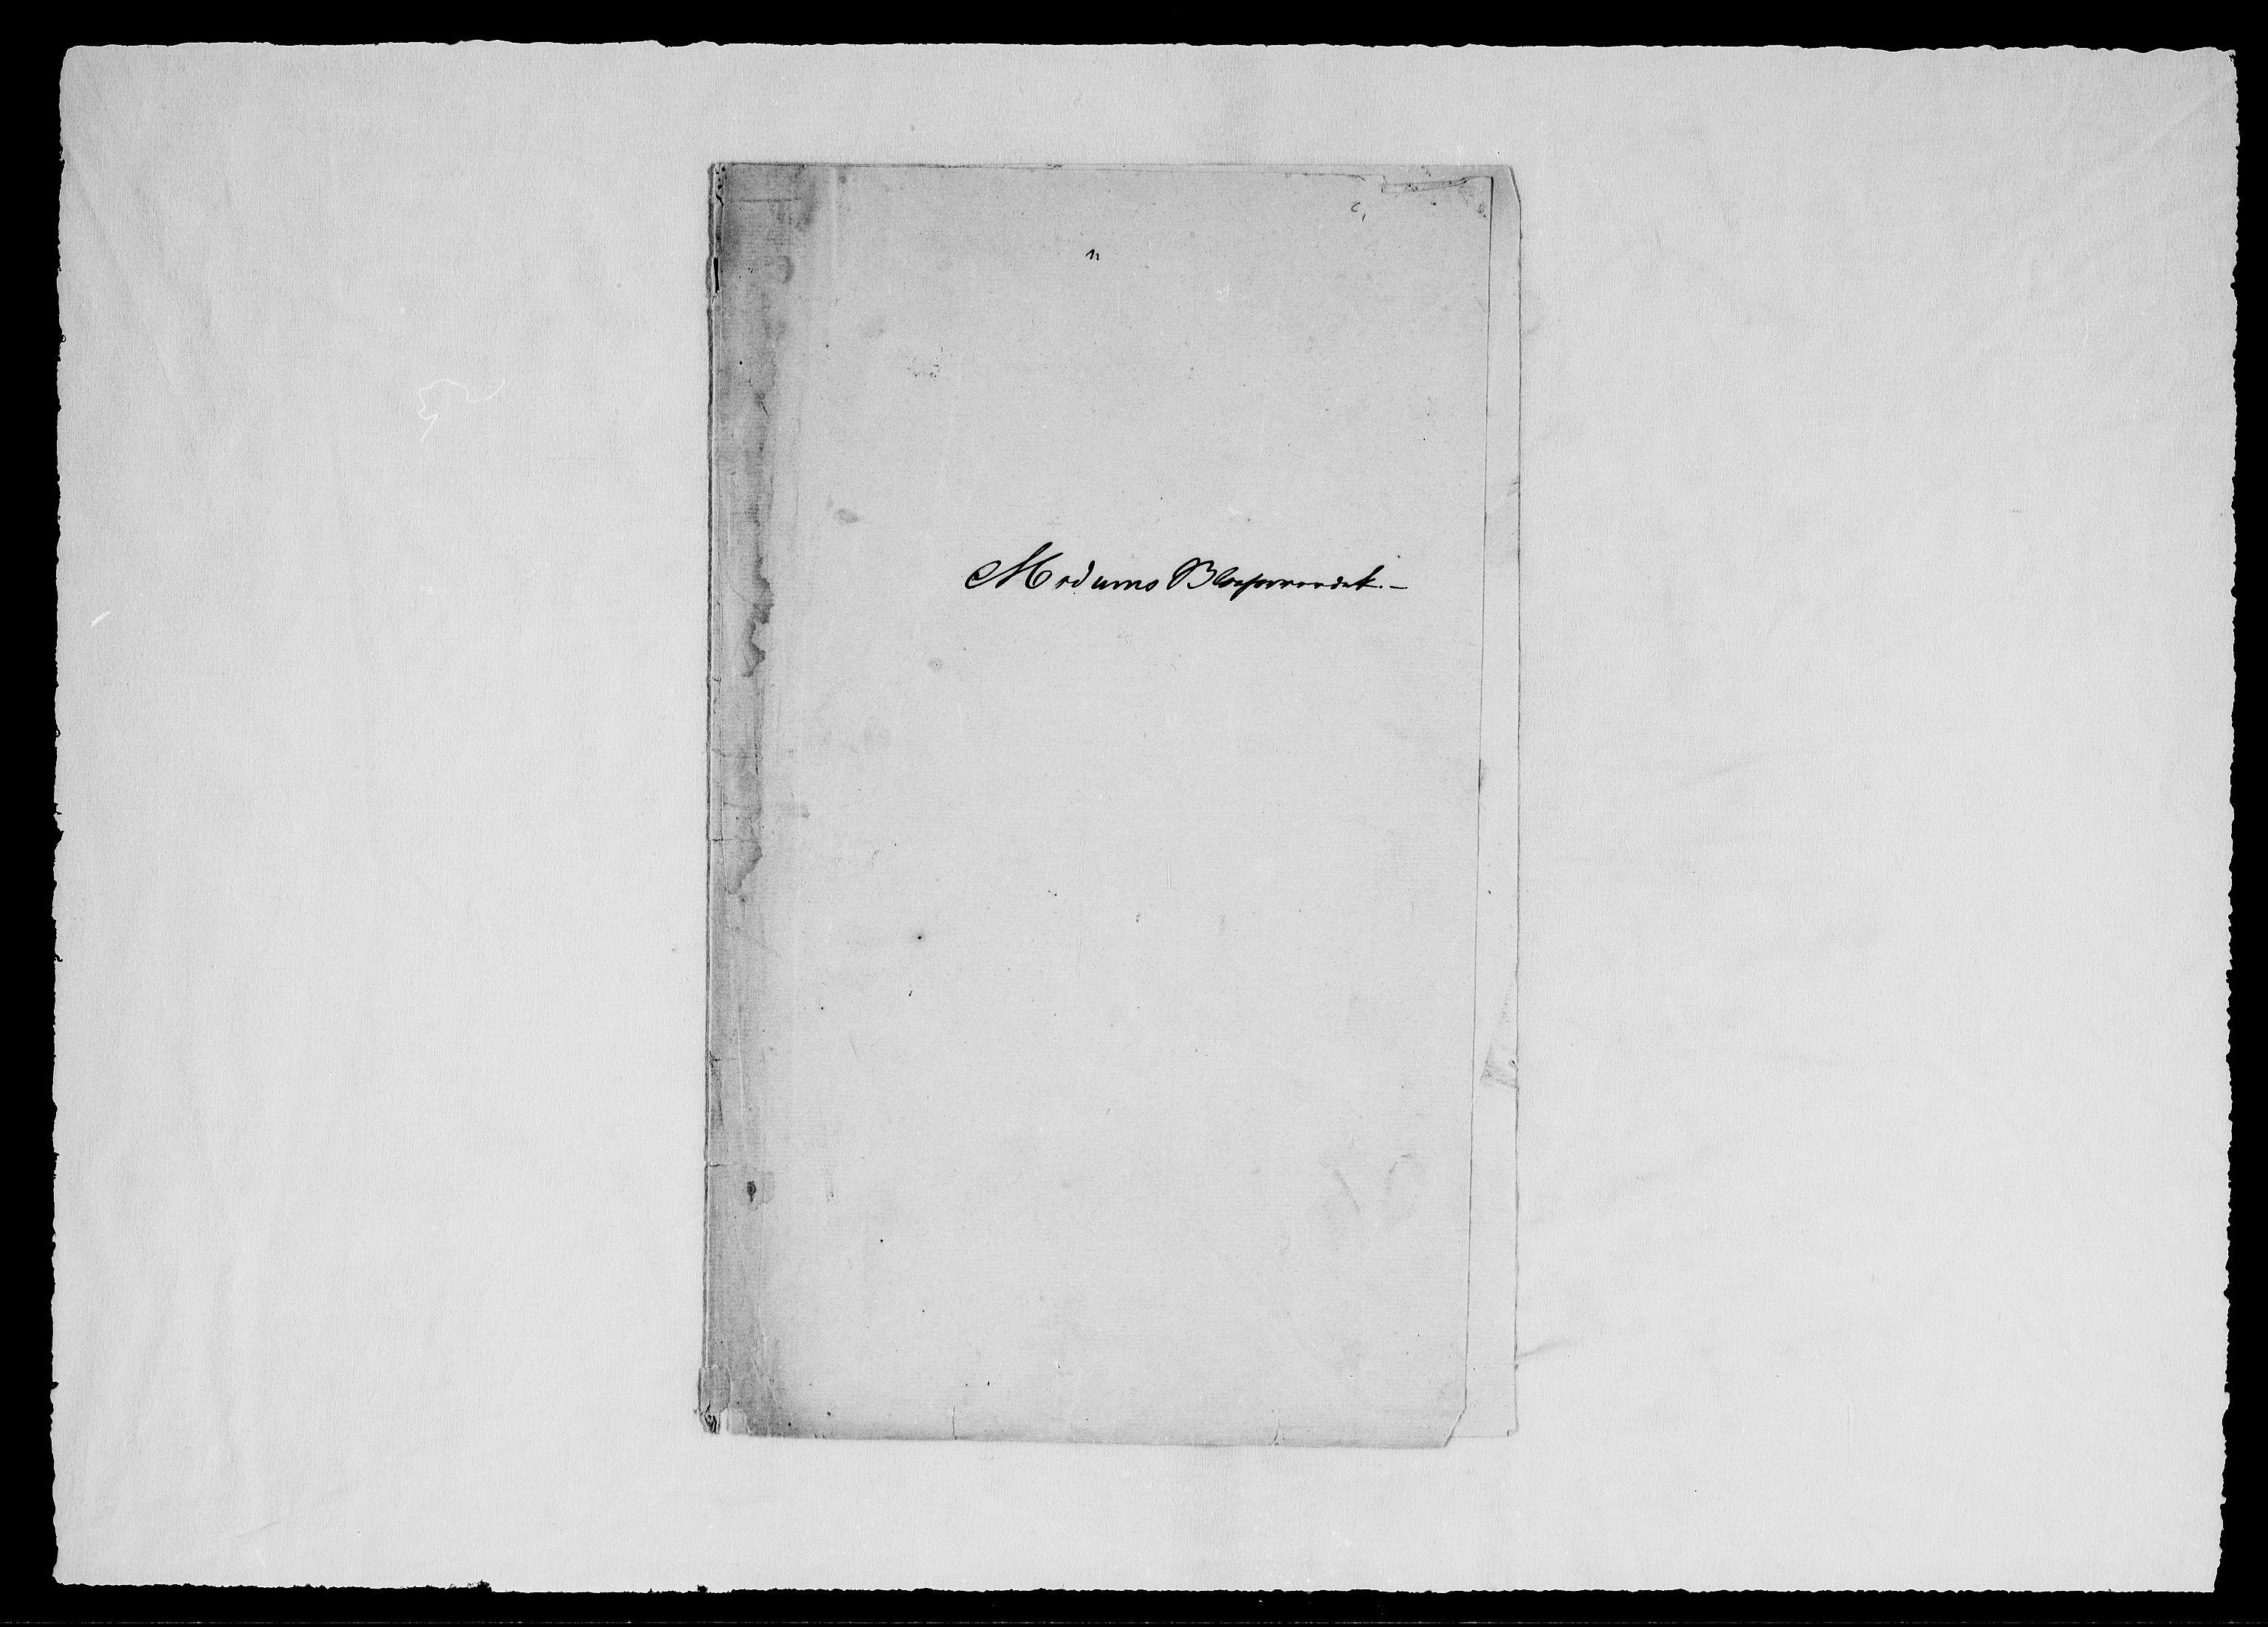 RA, Modums Blaafarveværk, G/Gc/L0160, 1786-1848, s. 2